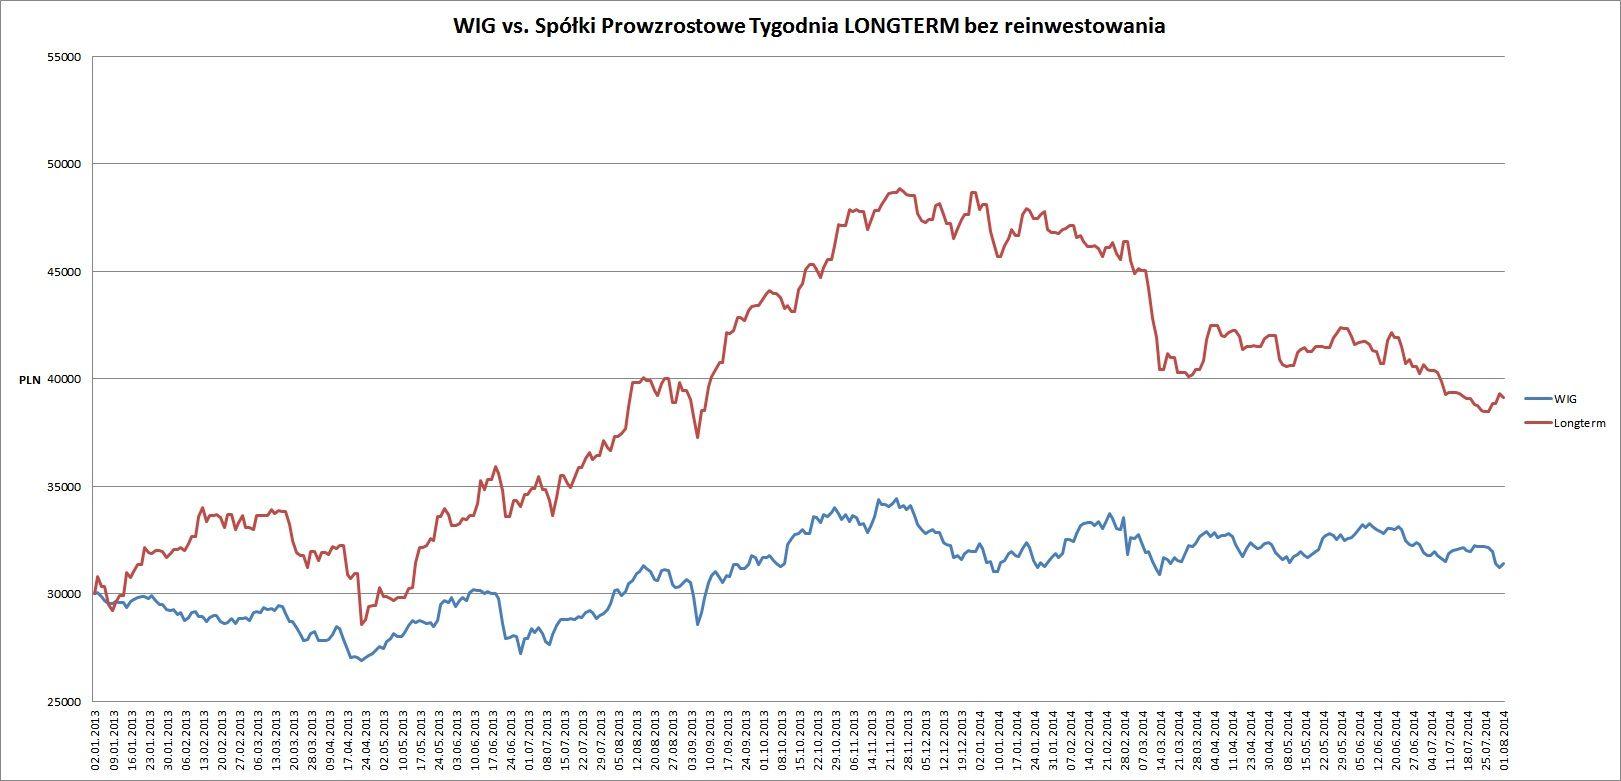 longterm vs wig od pocz. 2013